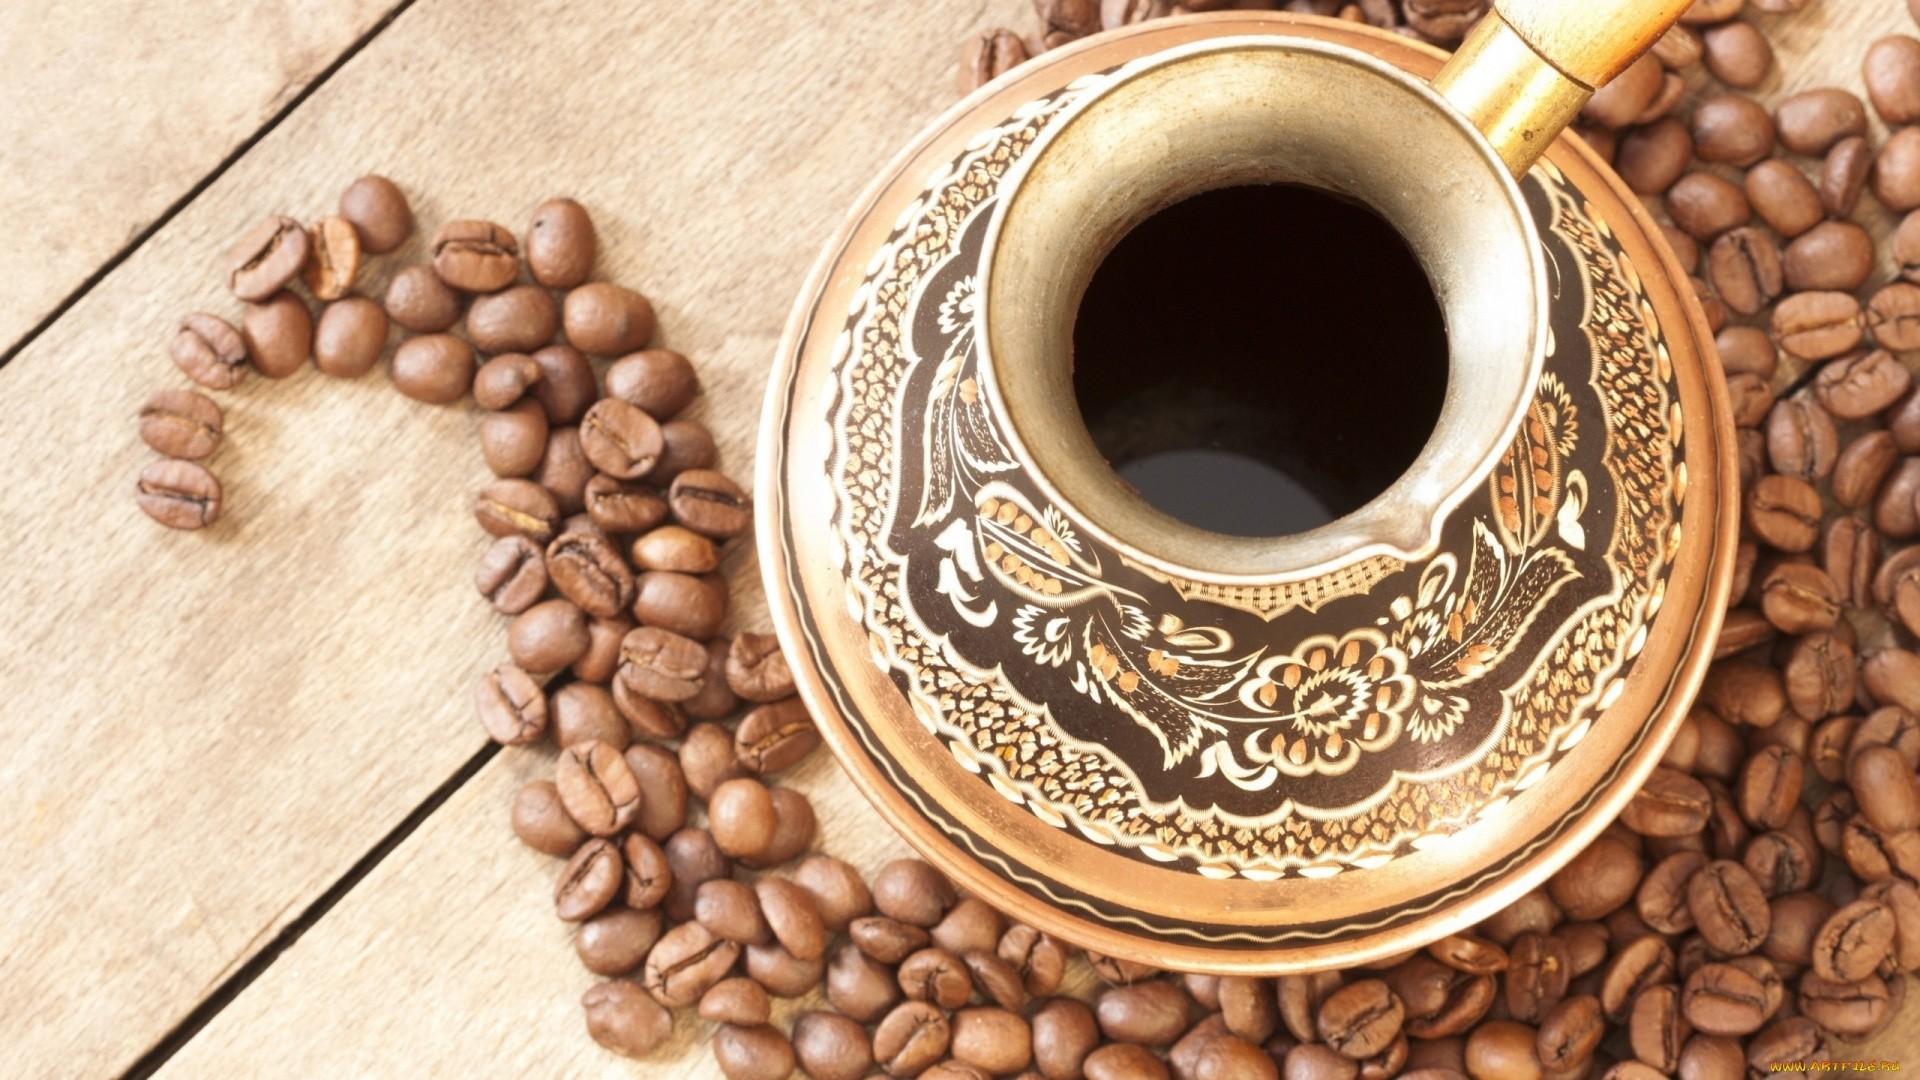 Coffee wallpaper photo hd